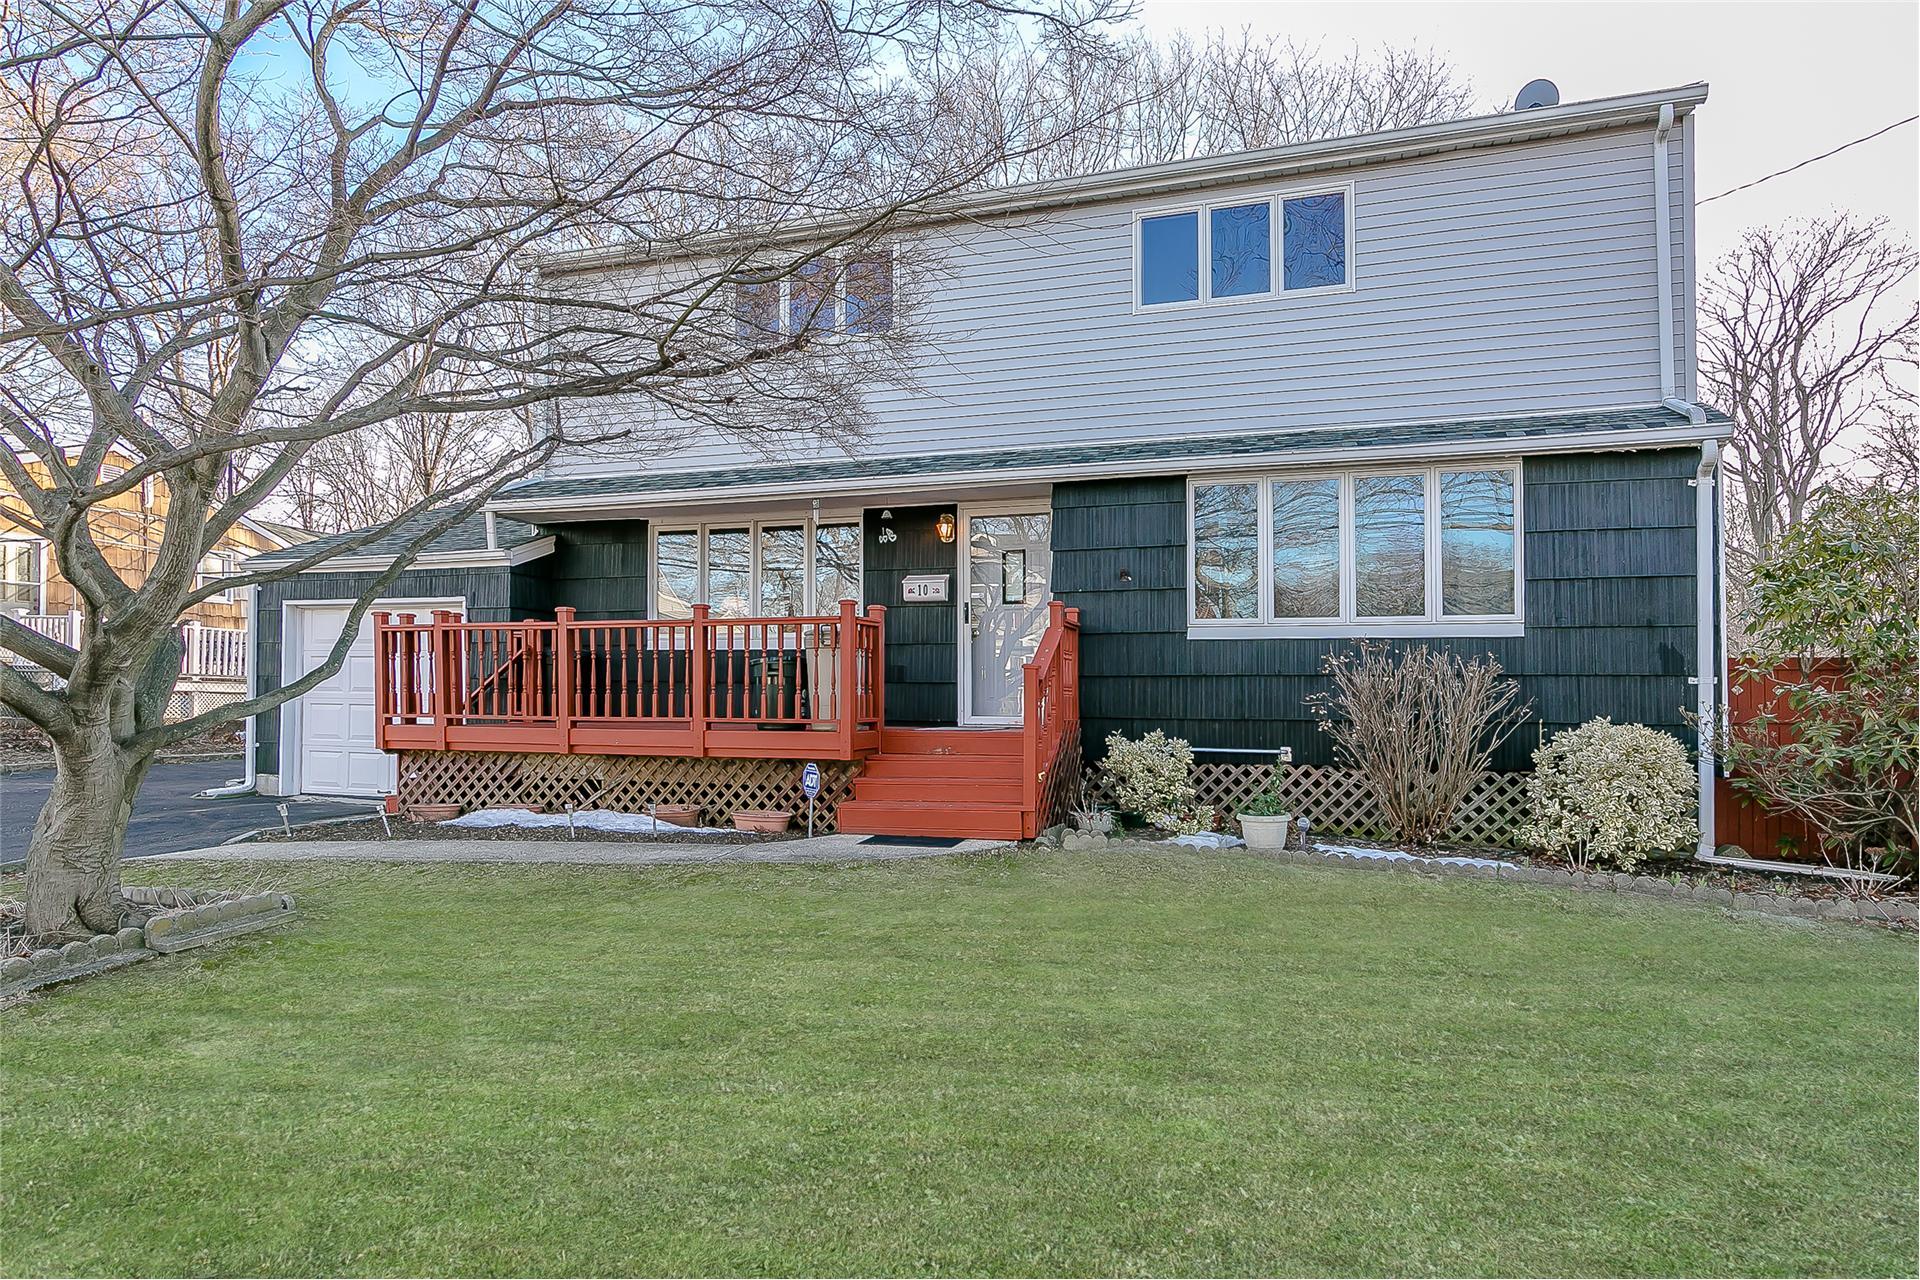 Single Family for Sale at 10 Barbara Rd Lake Ronkonkoma, New York 11779 United States